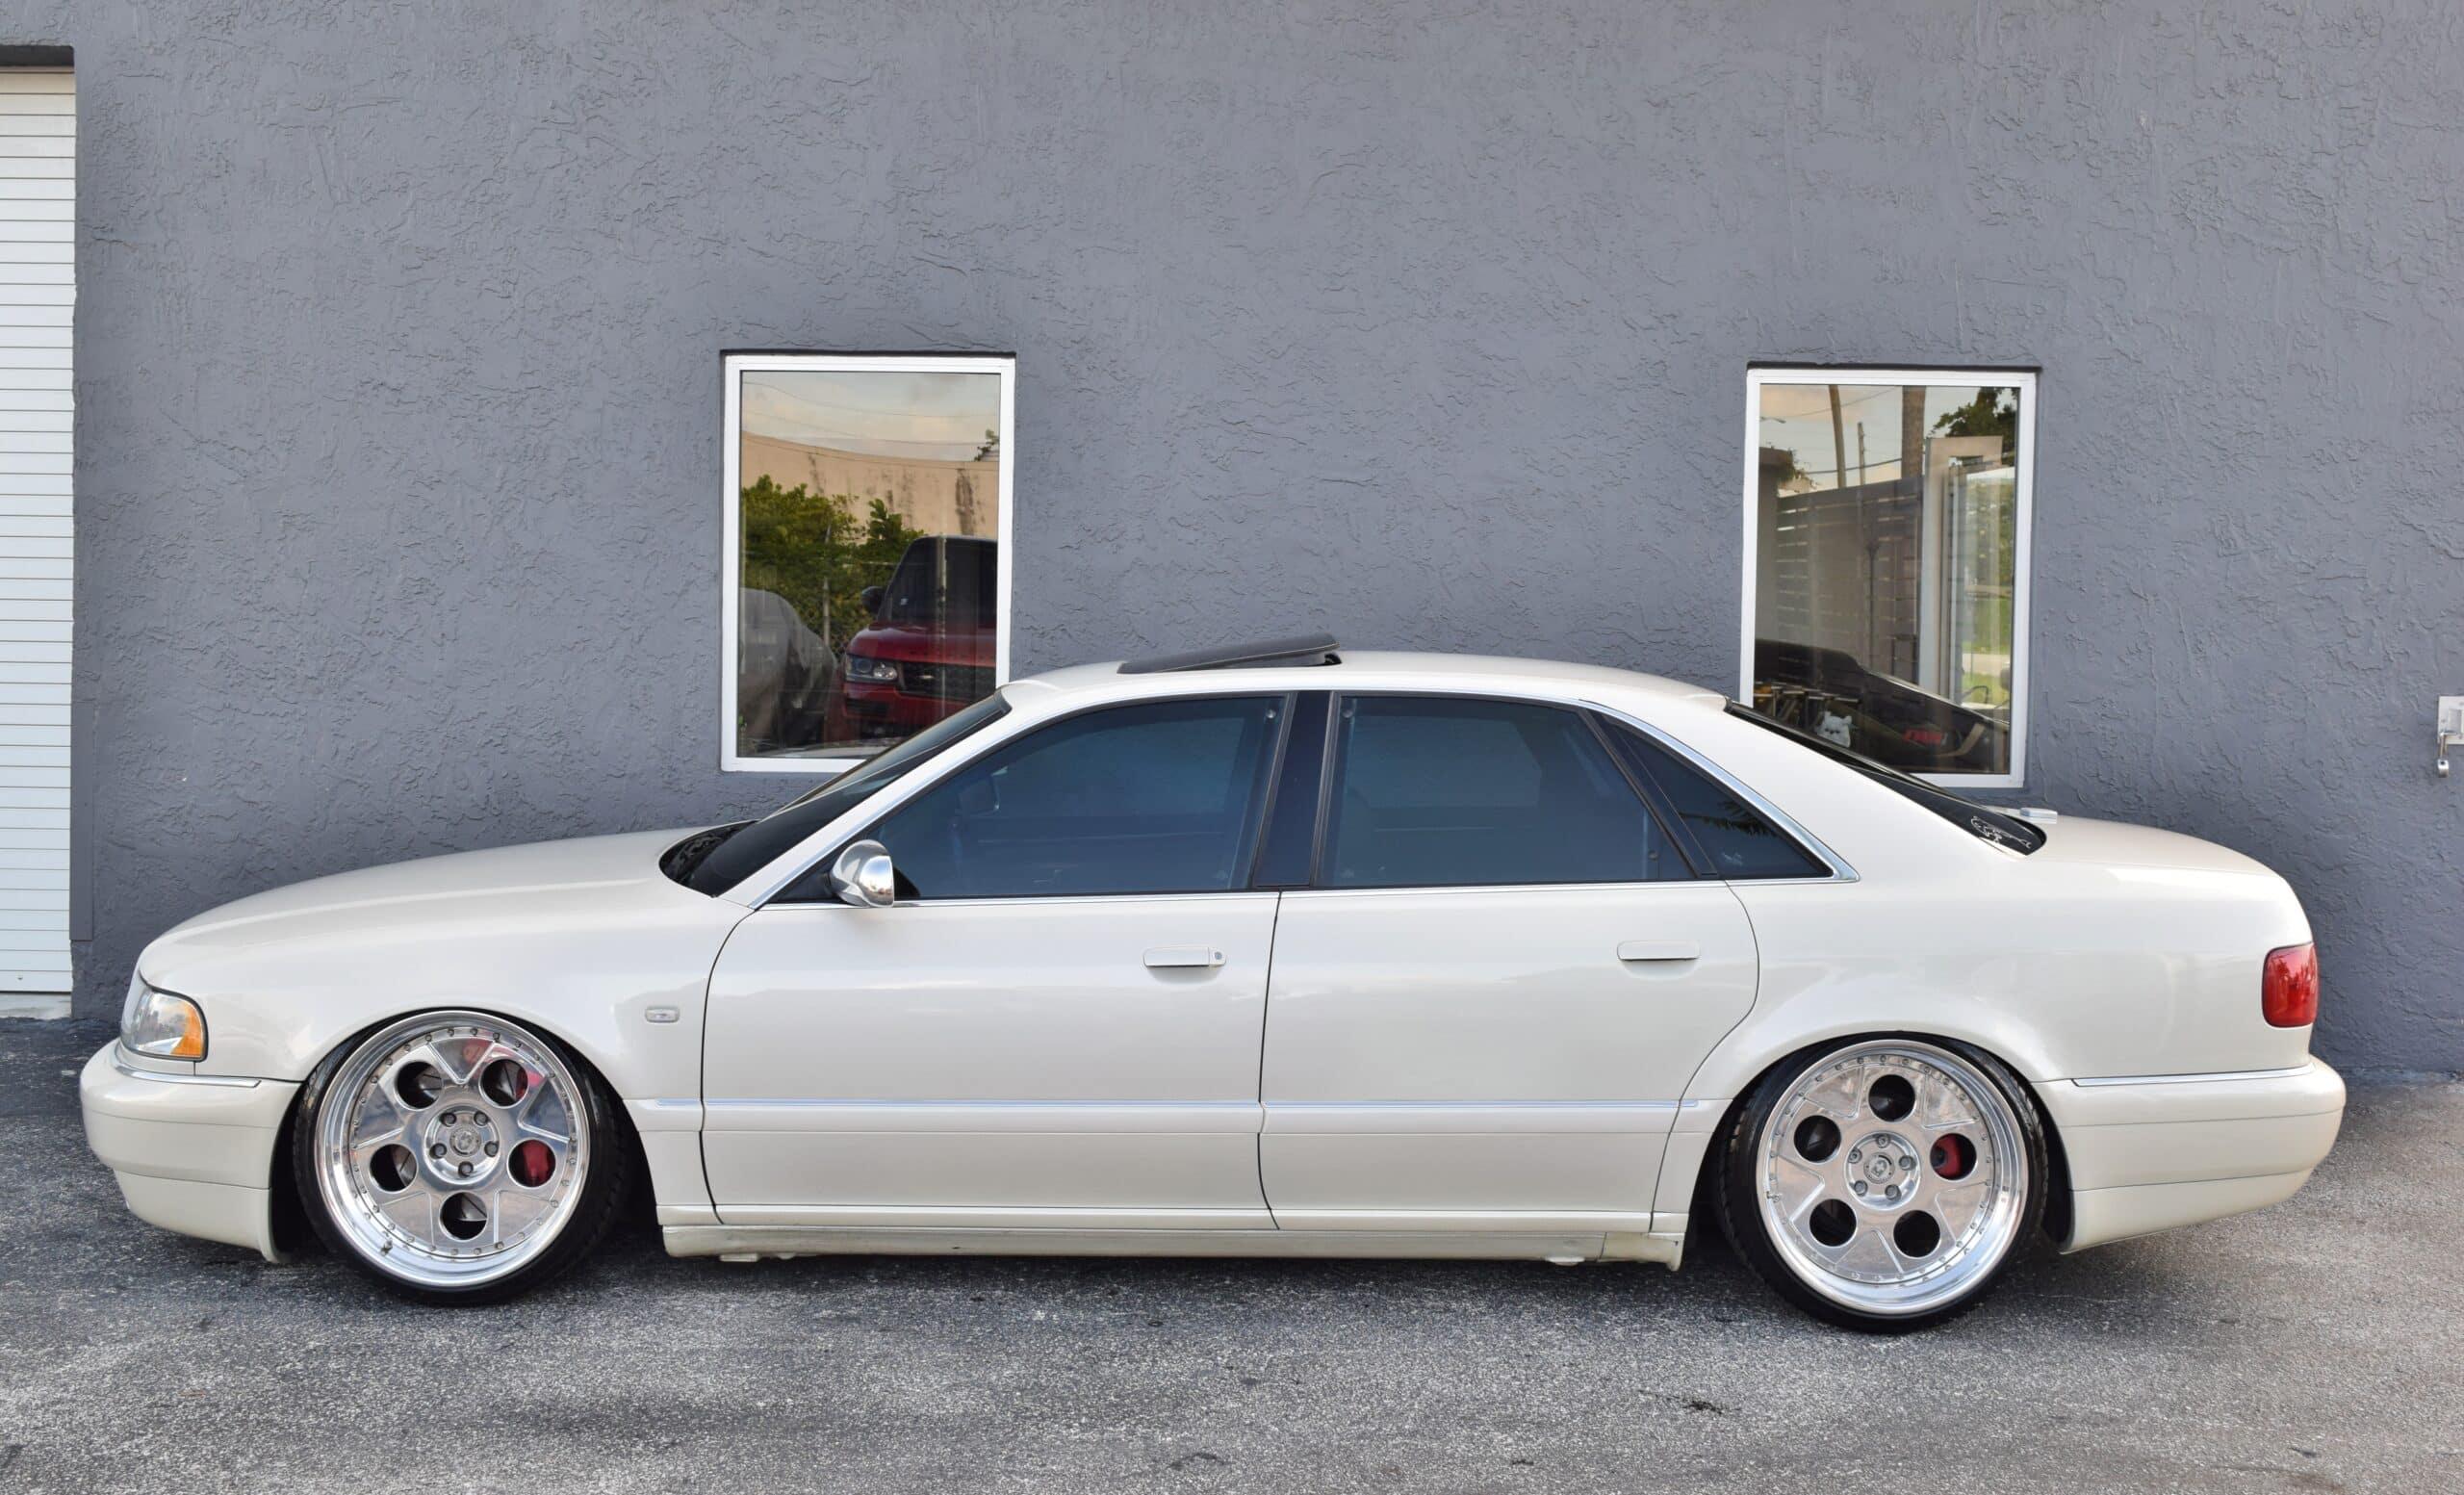 2002 Audi S8 Only 80K Miles-Custom airlift suspension-Custom HRE Wheels-Custom Sound System